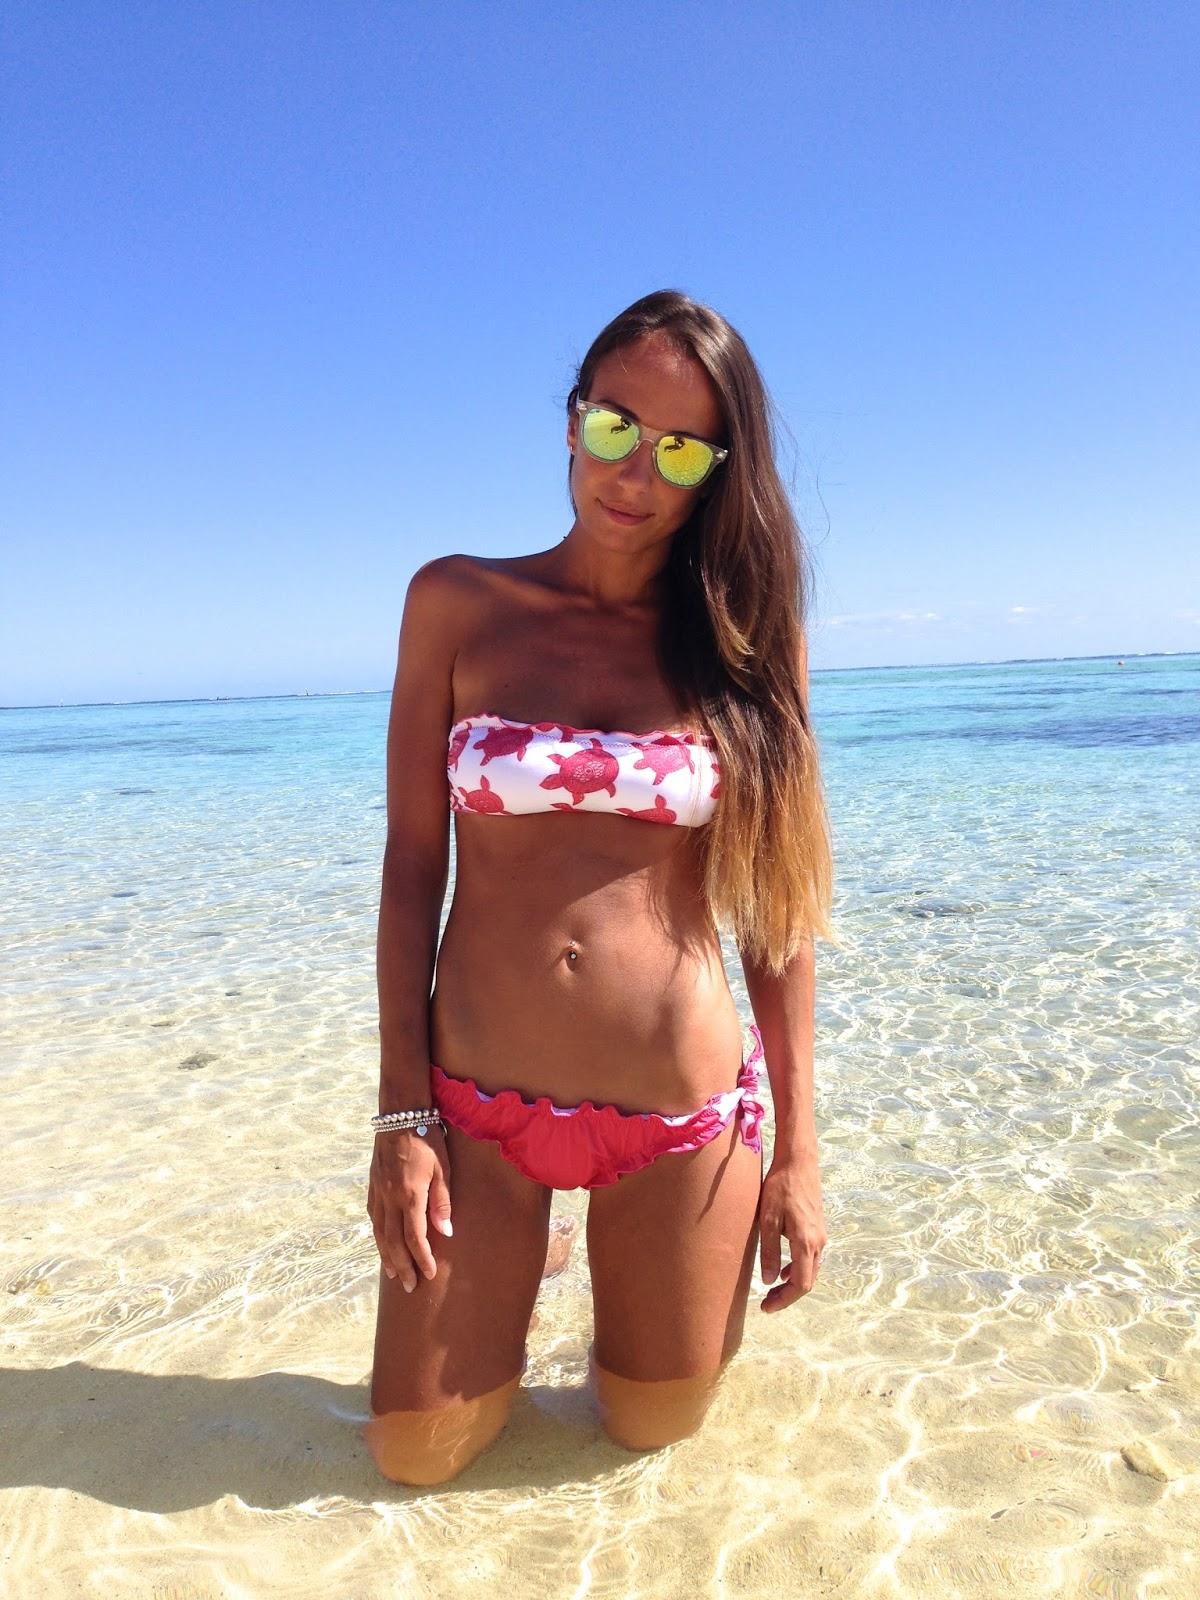 Mooreawith Love Beach Online